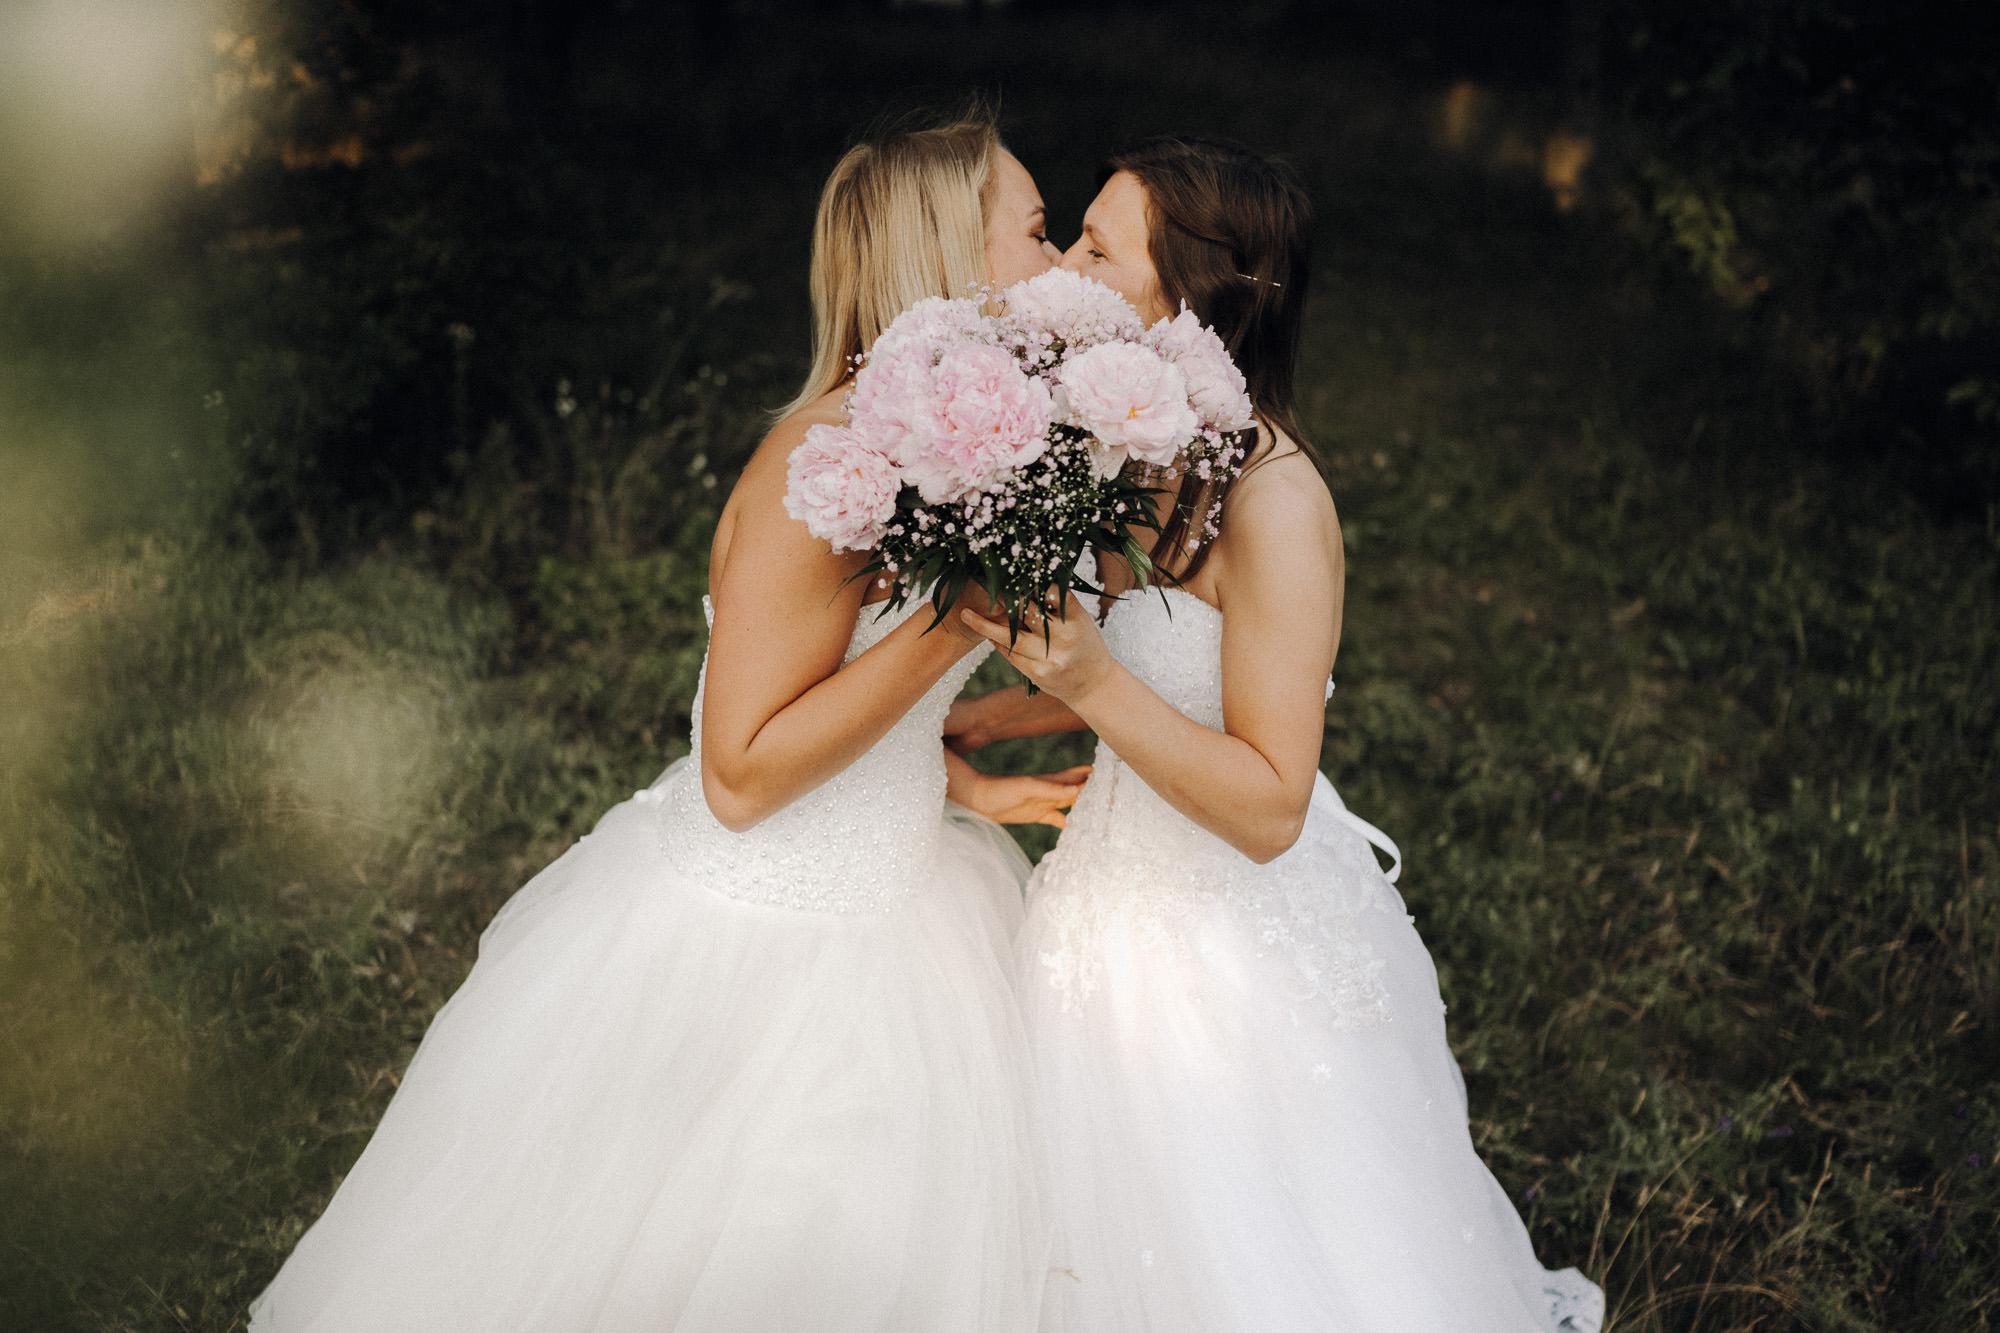 waltsmedia-hochzeitsreportage-after-wedding-shooting-berlin-4